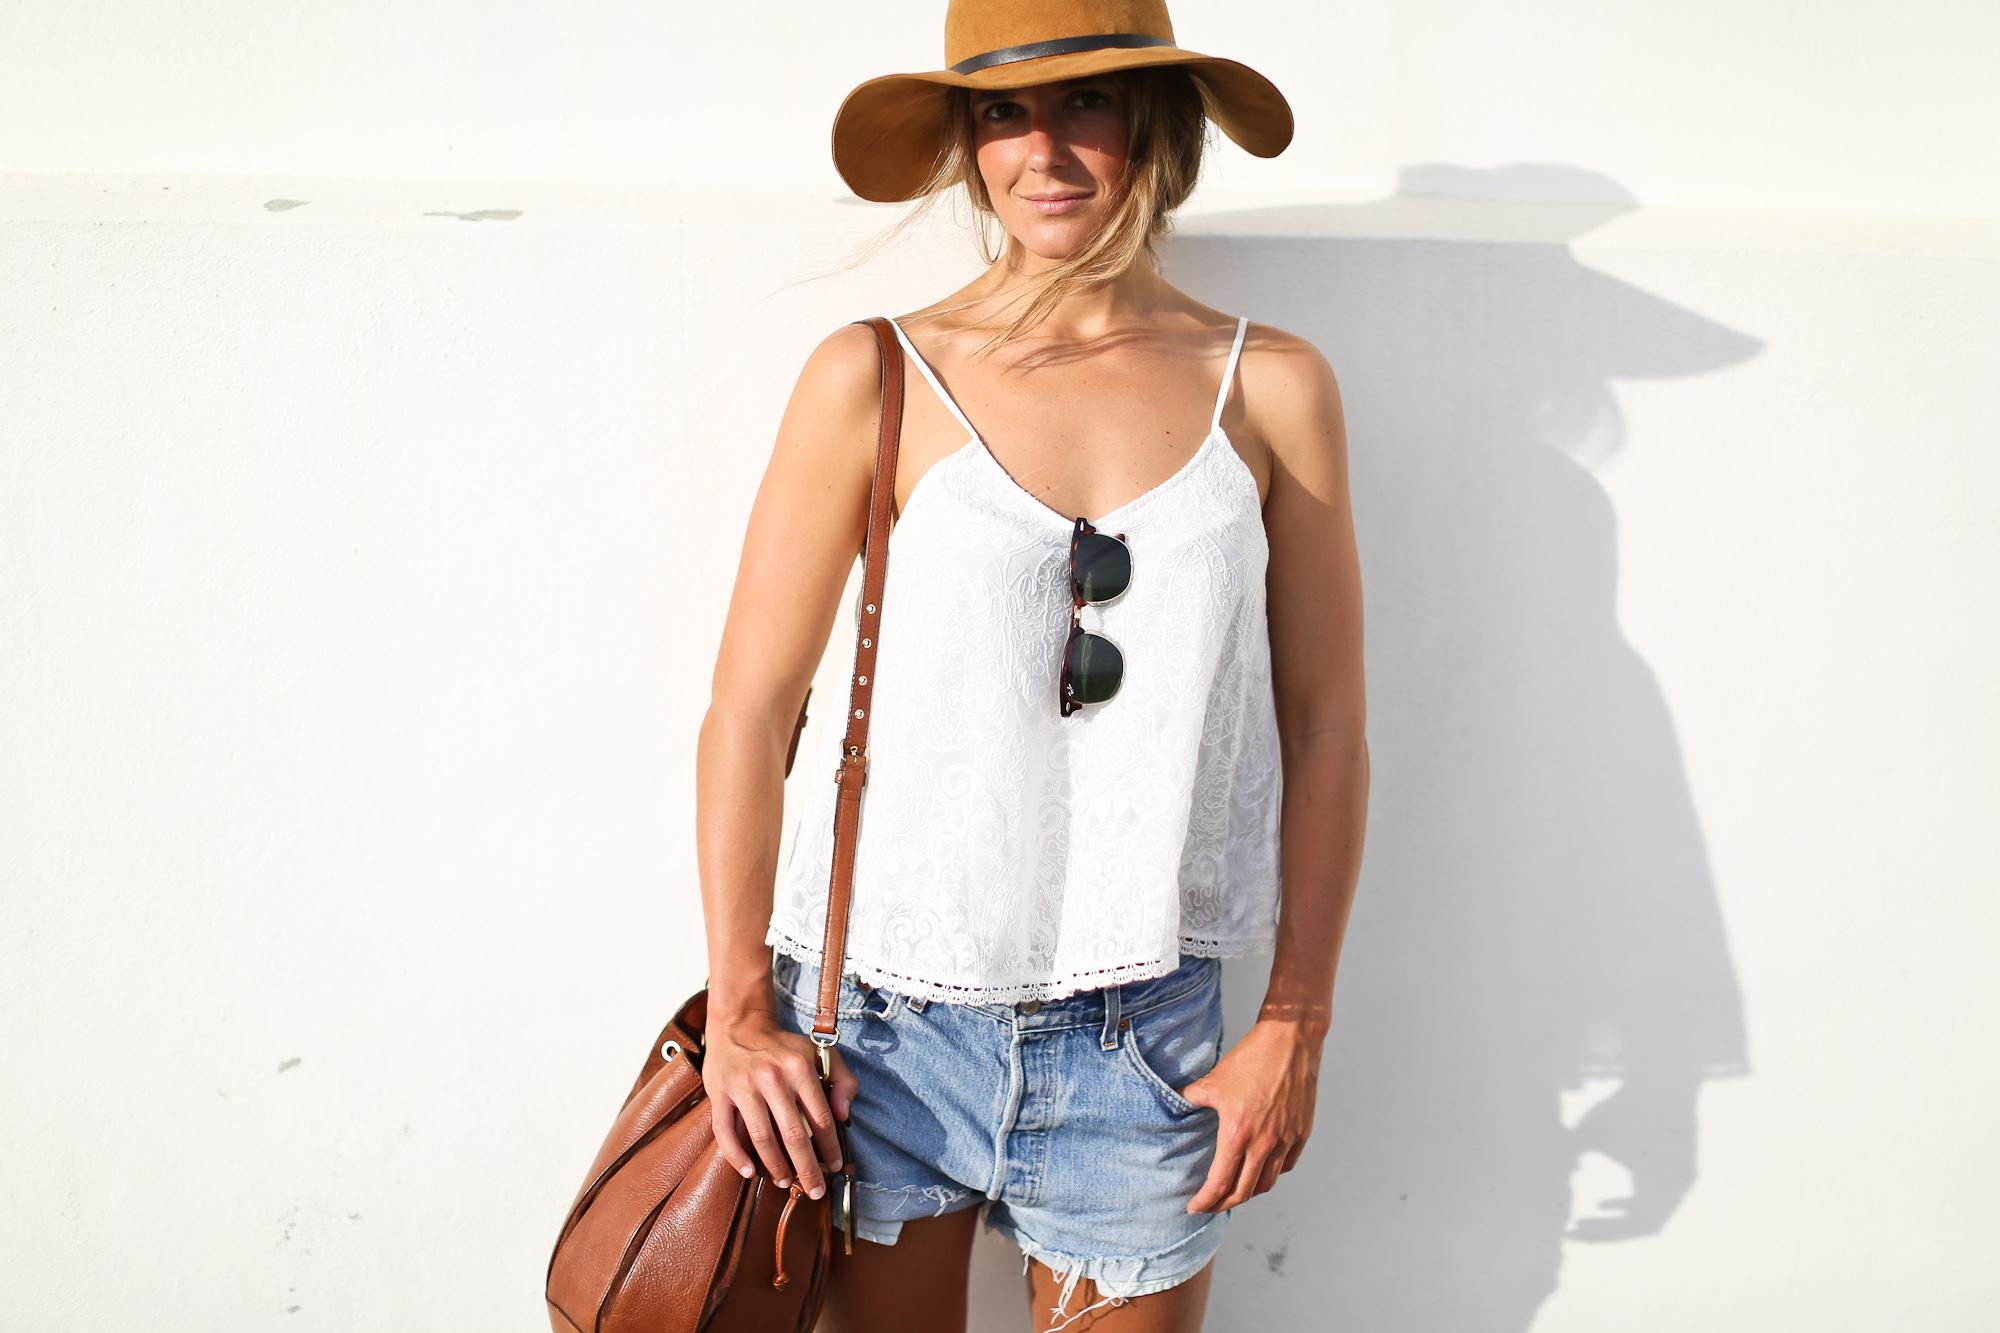 Clochet_streetstyle_levis_501_vintage_shorts_leather_fedora_hat-9